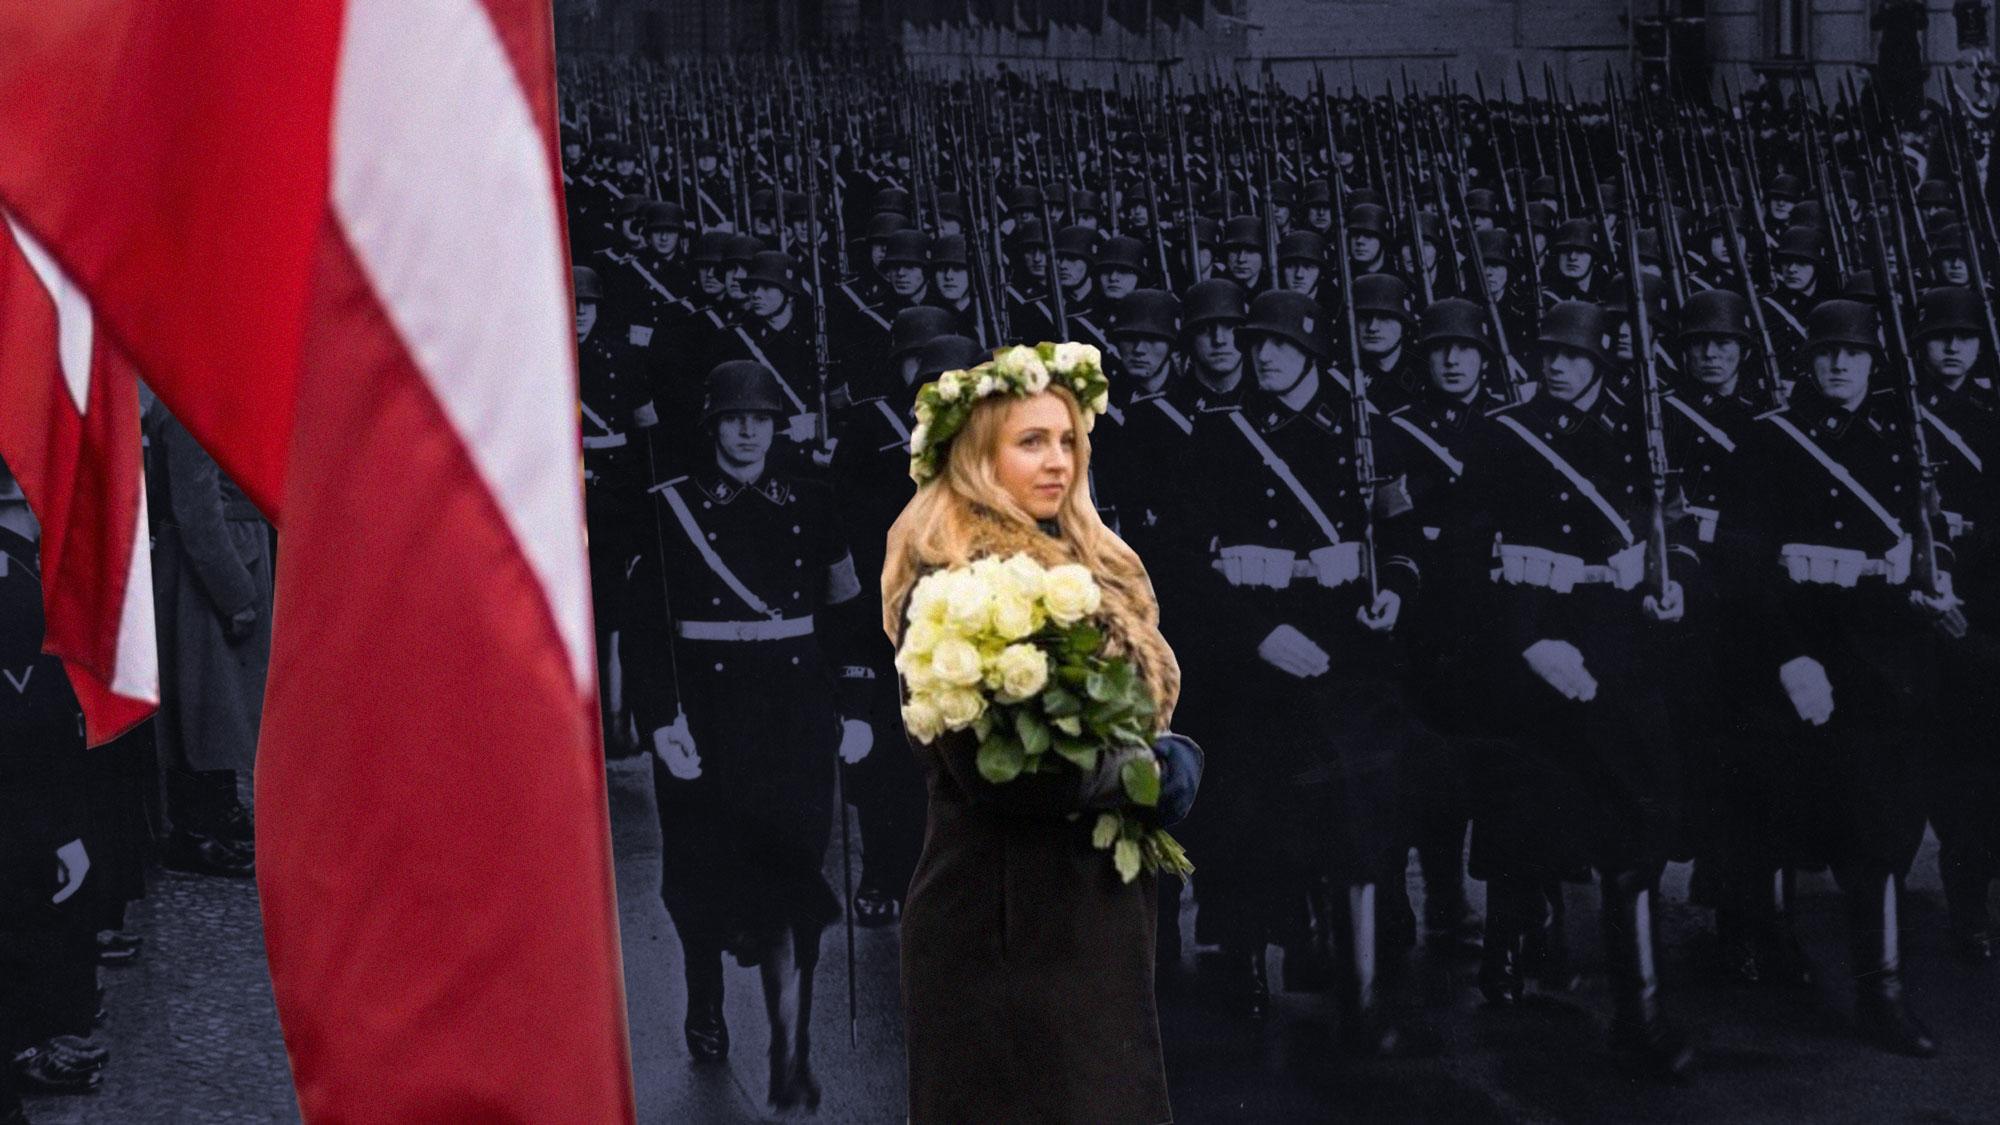 "<p>Коллаж © LIFE. Фото © Getty Images, © <a href=""https://www.nacionalaapvieniba.lv/gallery/2019-gada-16-marta-pieminas-pasakums/"" target=""_blank"" rel=""noopener noreferrer"">Nacionālā apvienība Visu Latvijai!  </a></p>"